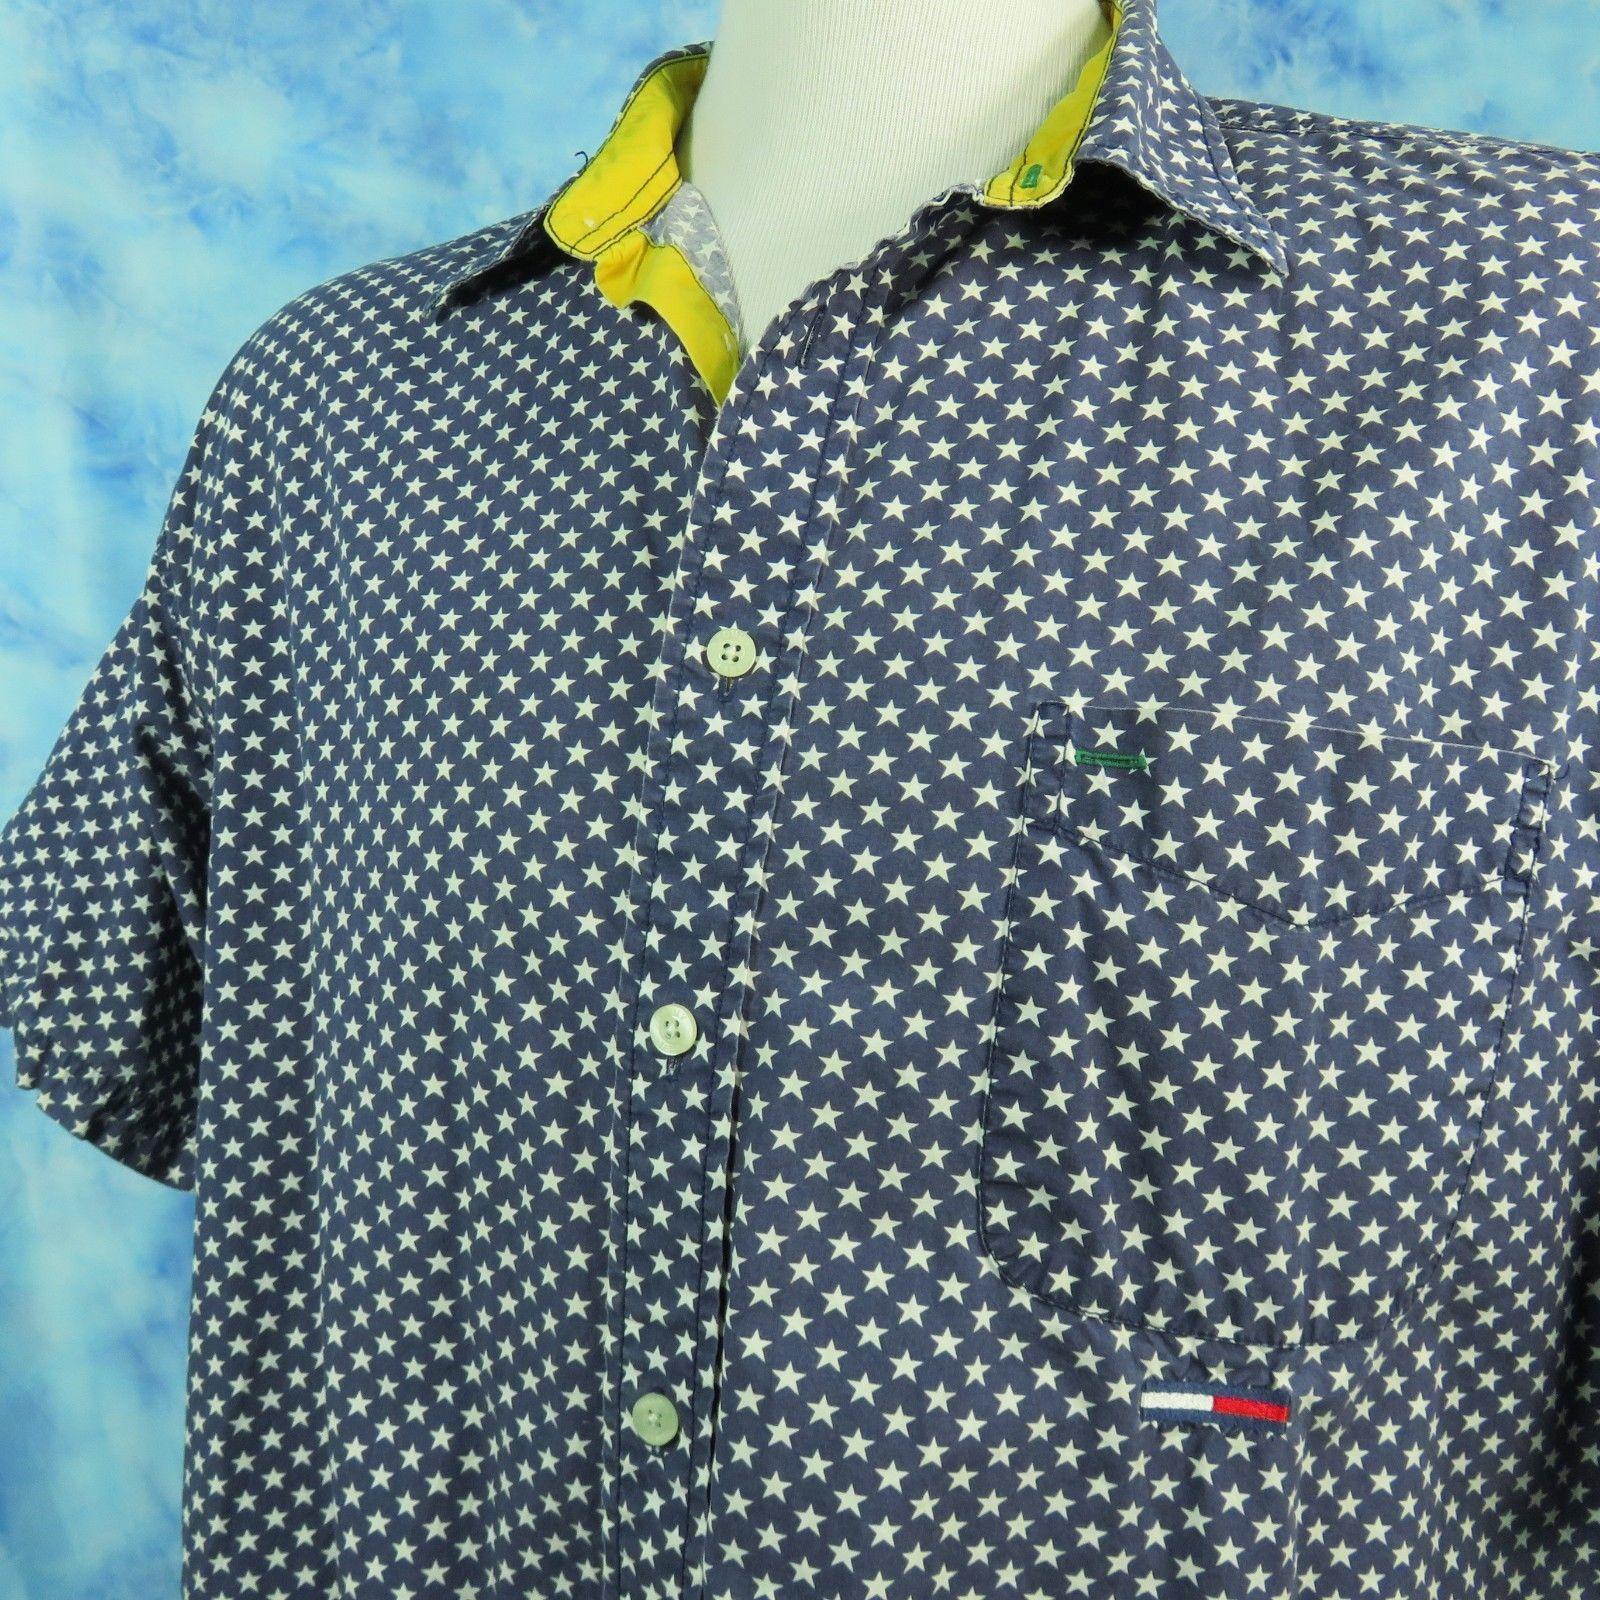 a66336d28 Vtg 90s Tommy Hilfiger Shirt Mens XXL Stars and 48 similar items. 57